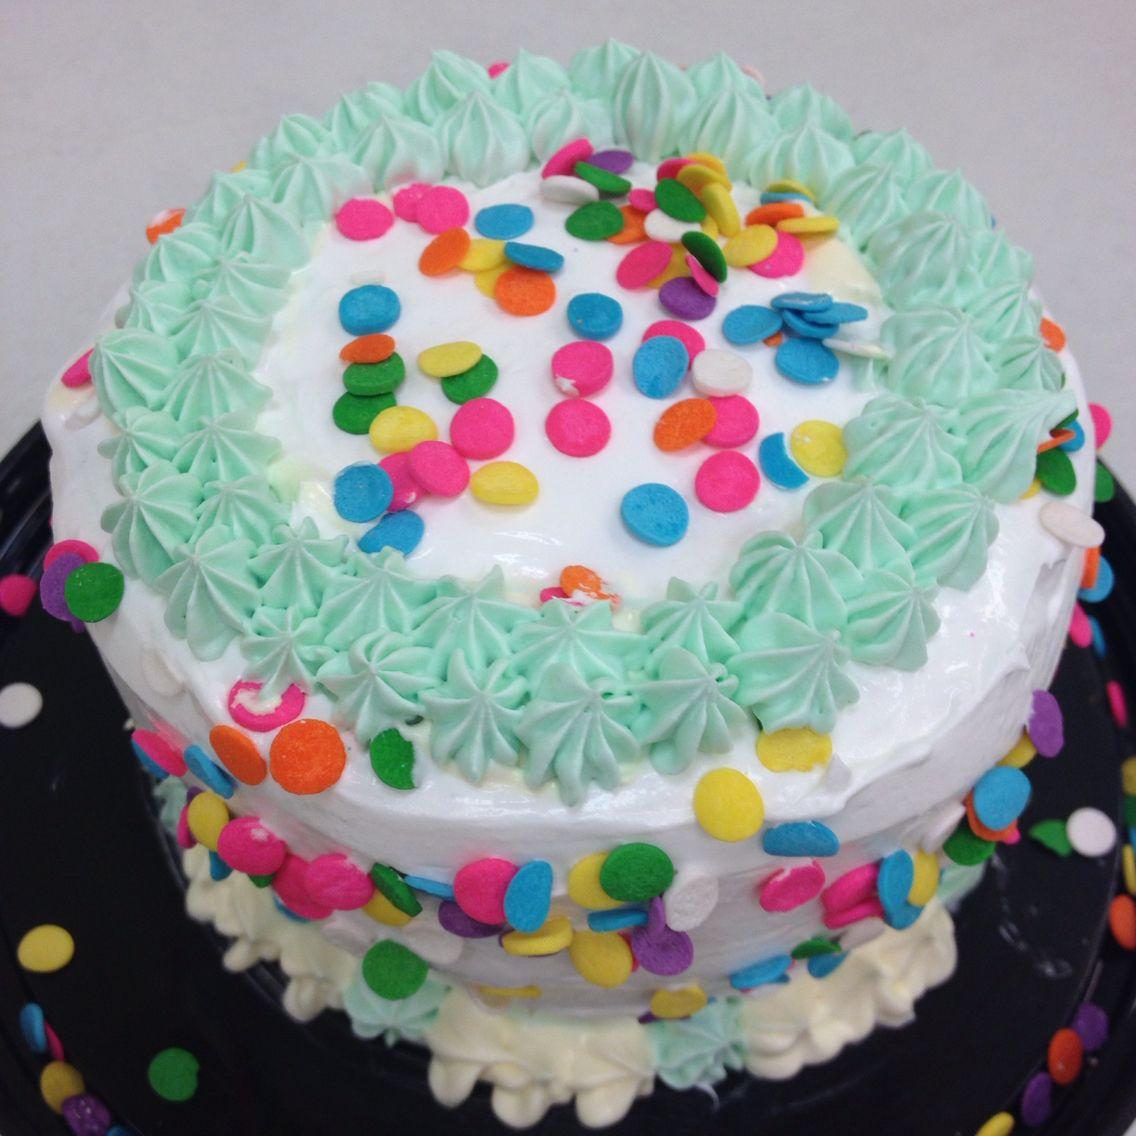 Confetti frozen yogurt baby cake from yofreshhatfield